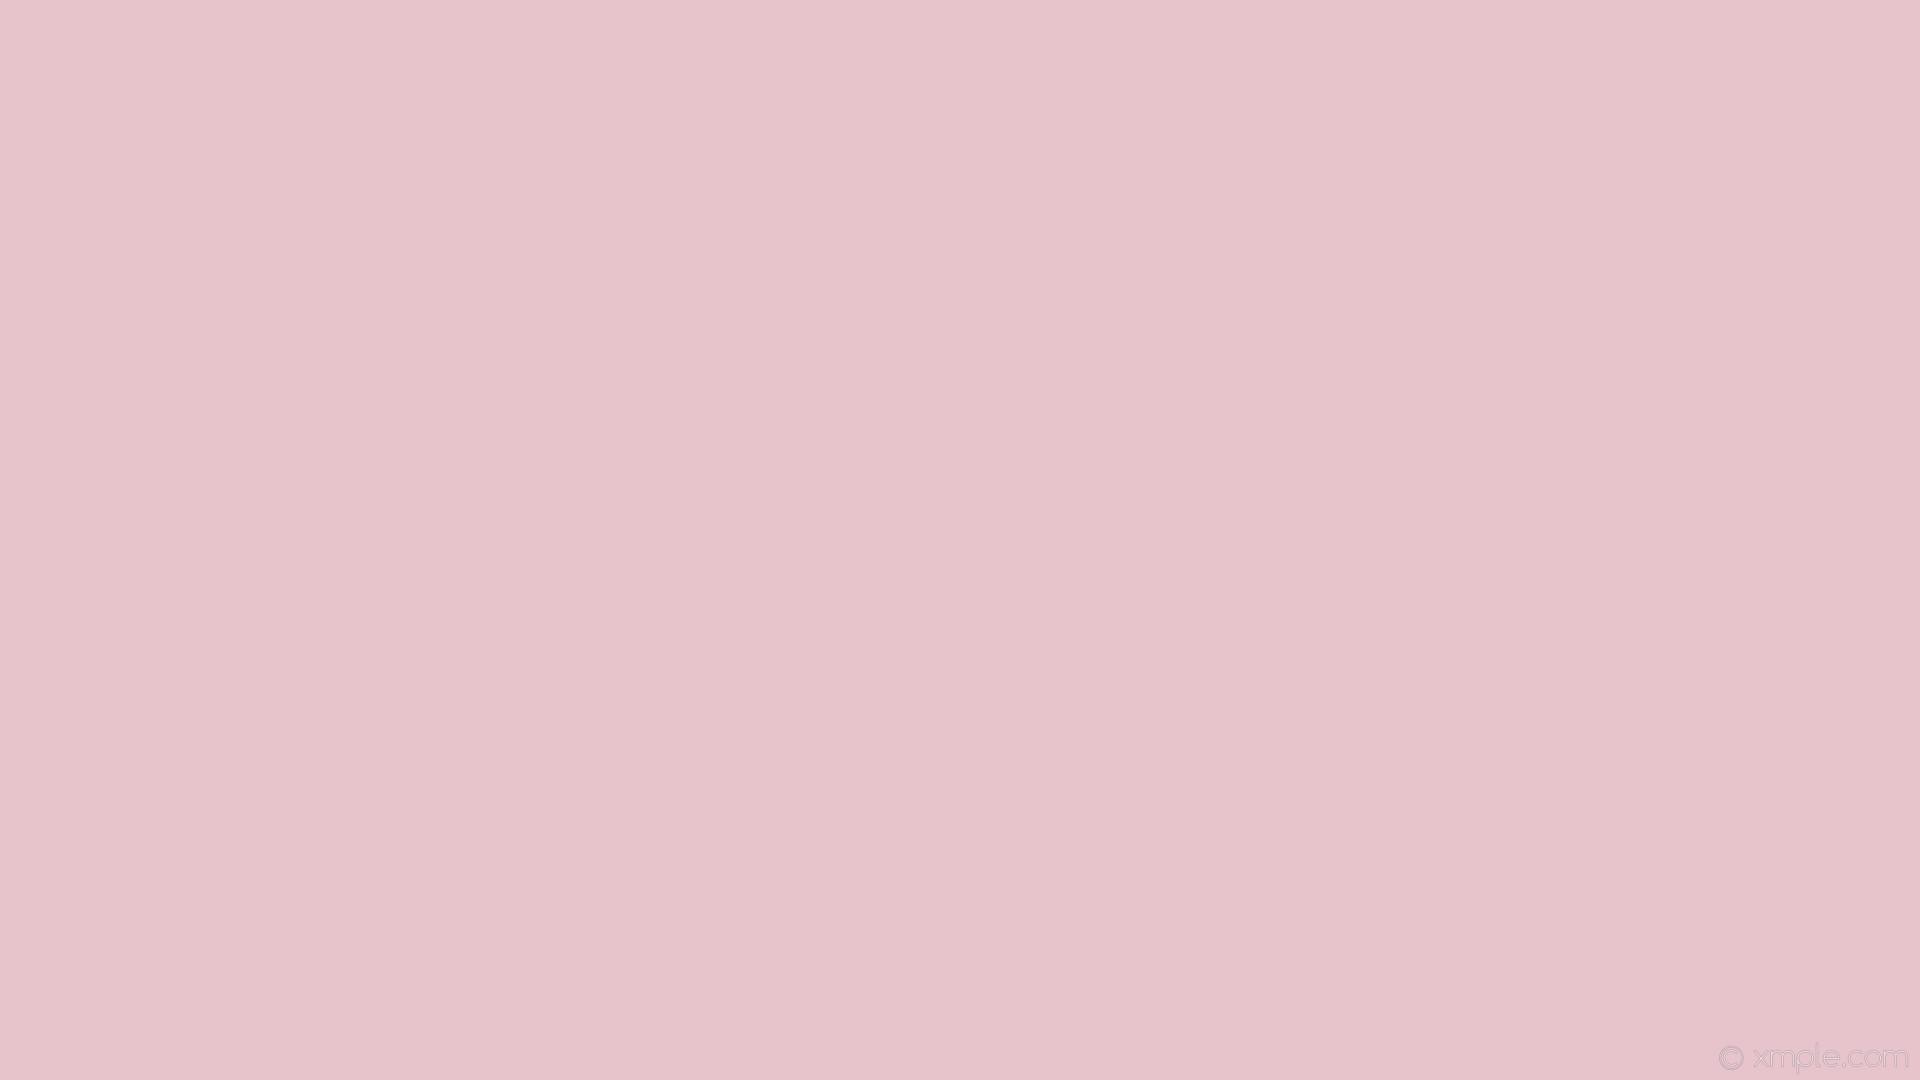 Plain Pink Wallpaper 69 Images